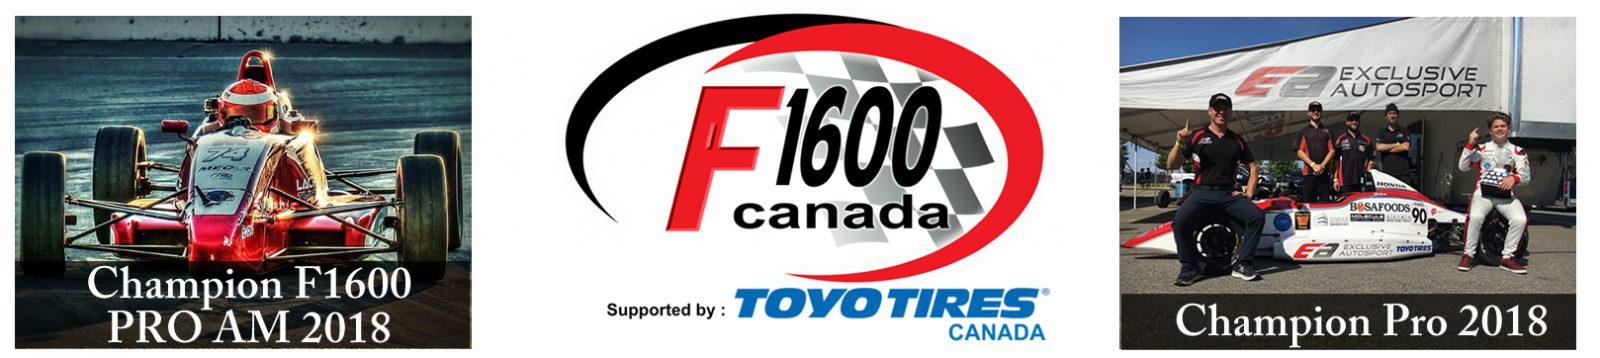 F1600 Canada